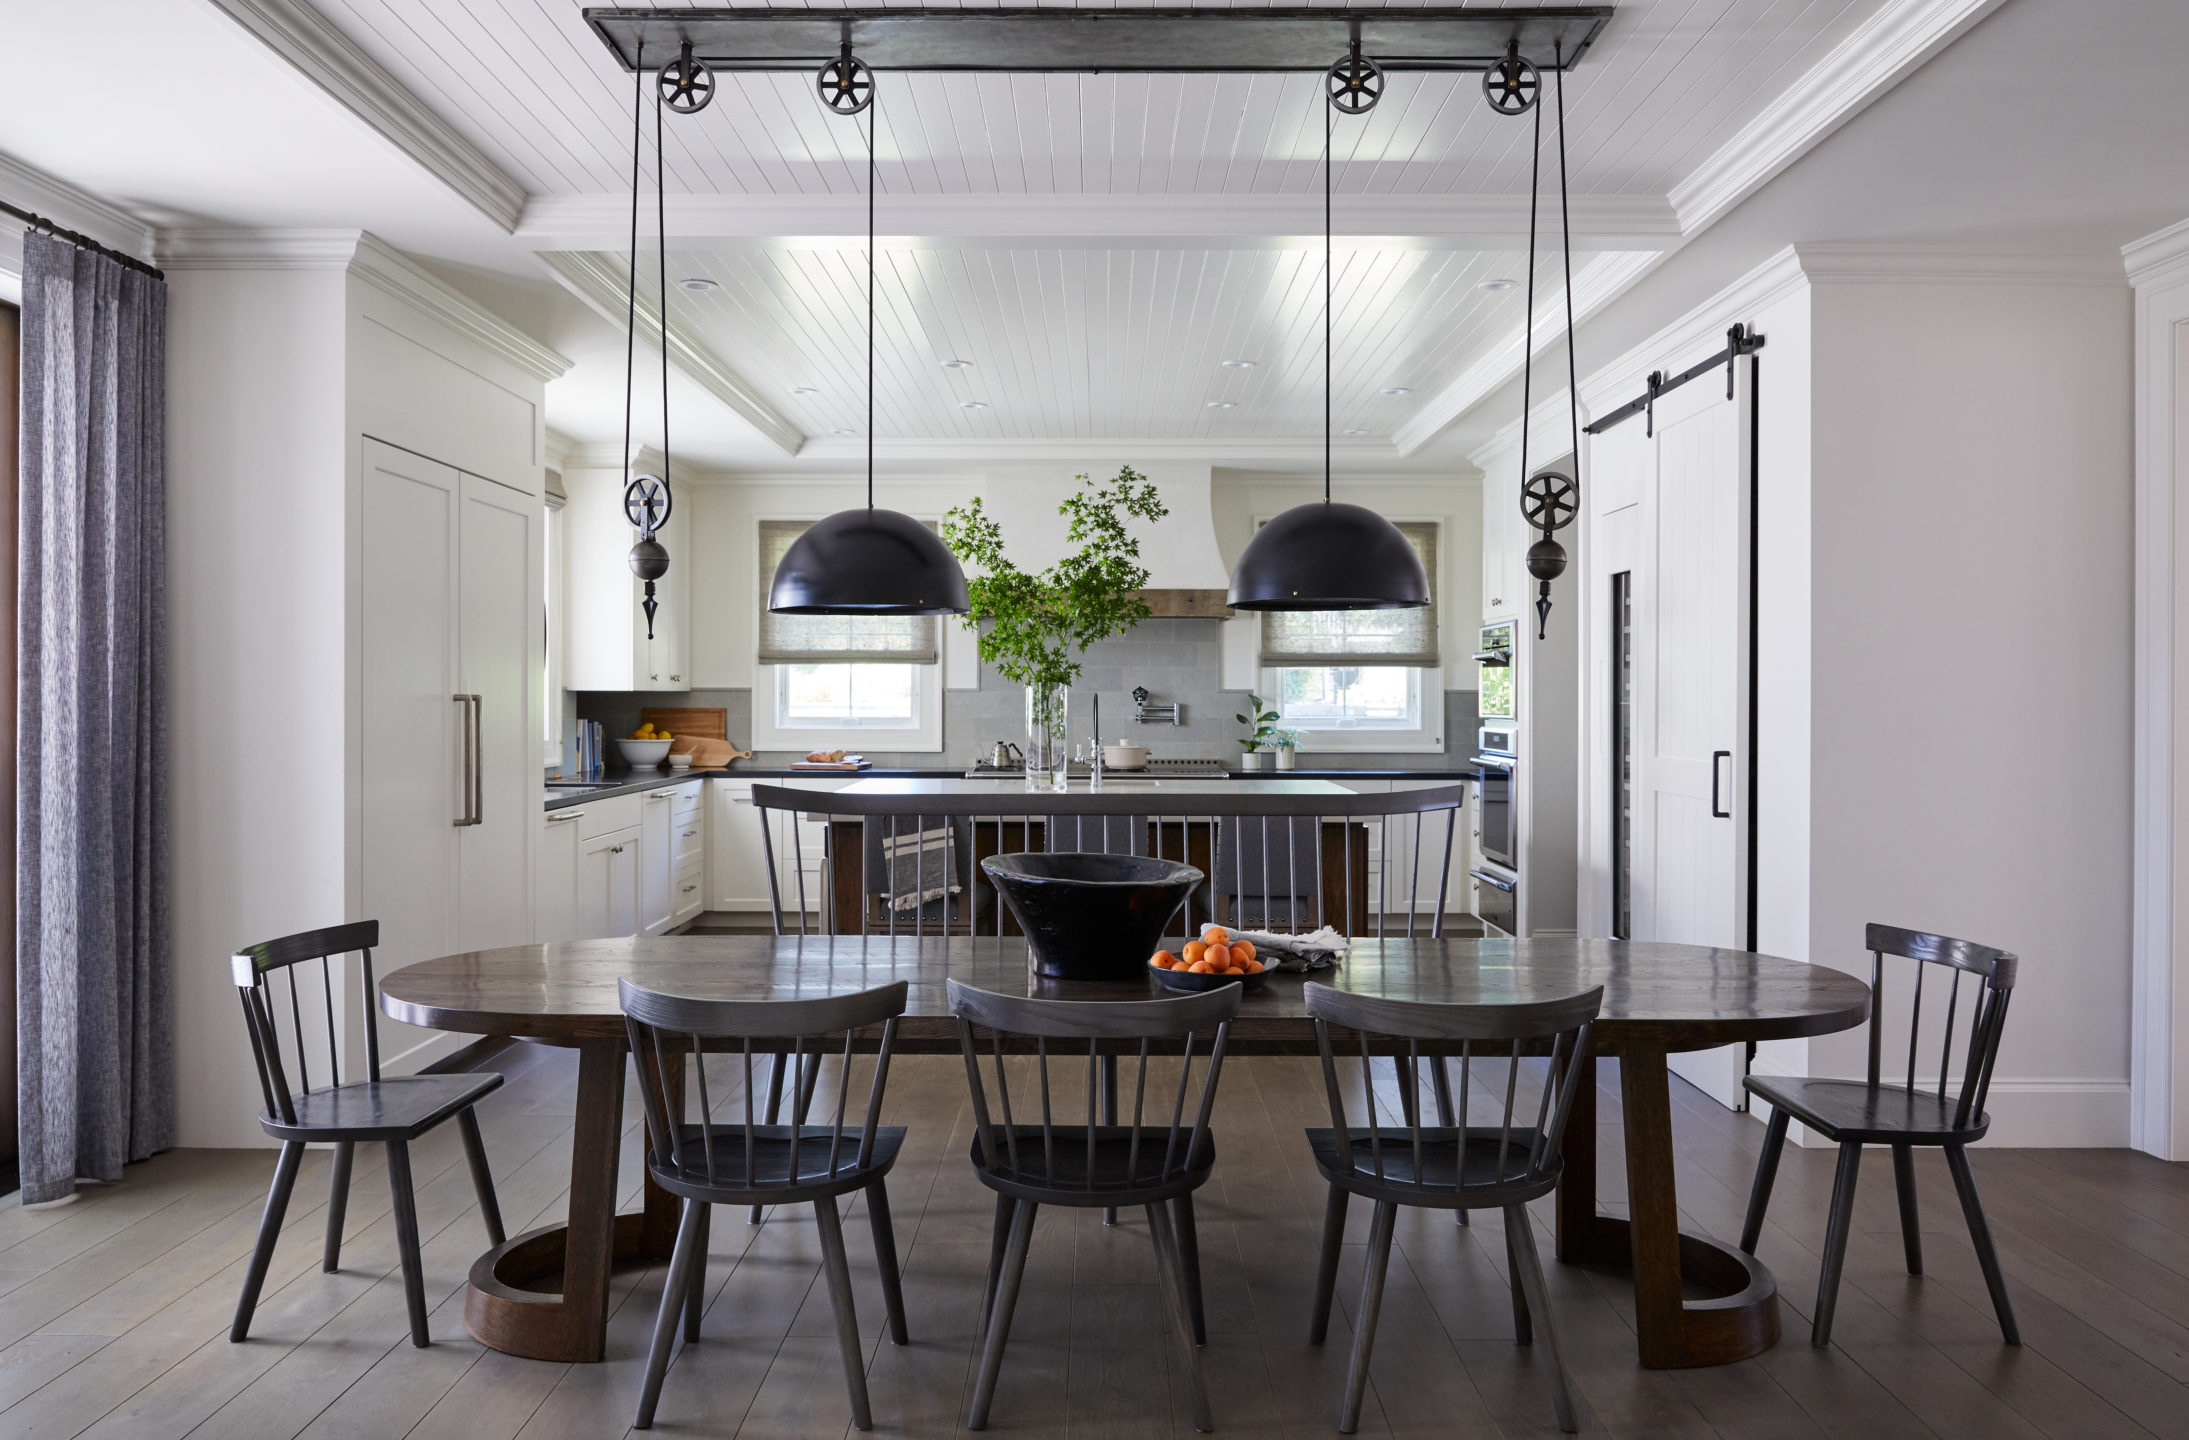 Jennifer_robins_interiors_projects_healdsburg_1_kitchen_dining_room_table_lookthrough